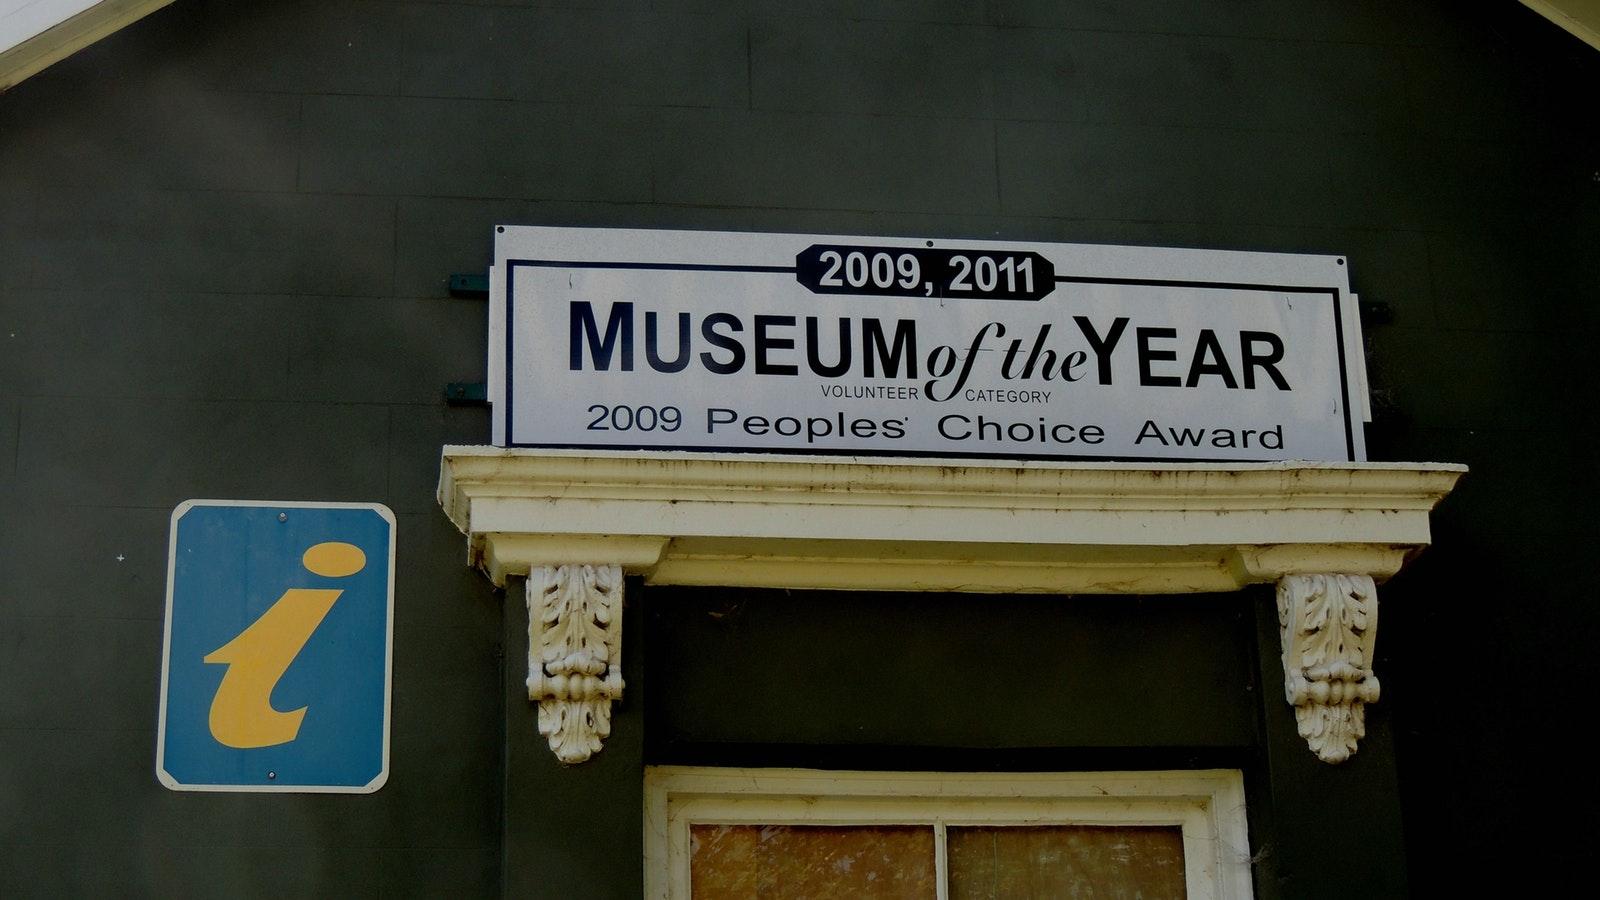 Benalla Costume and Kelly Museum